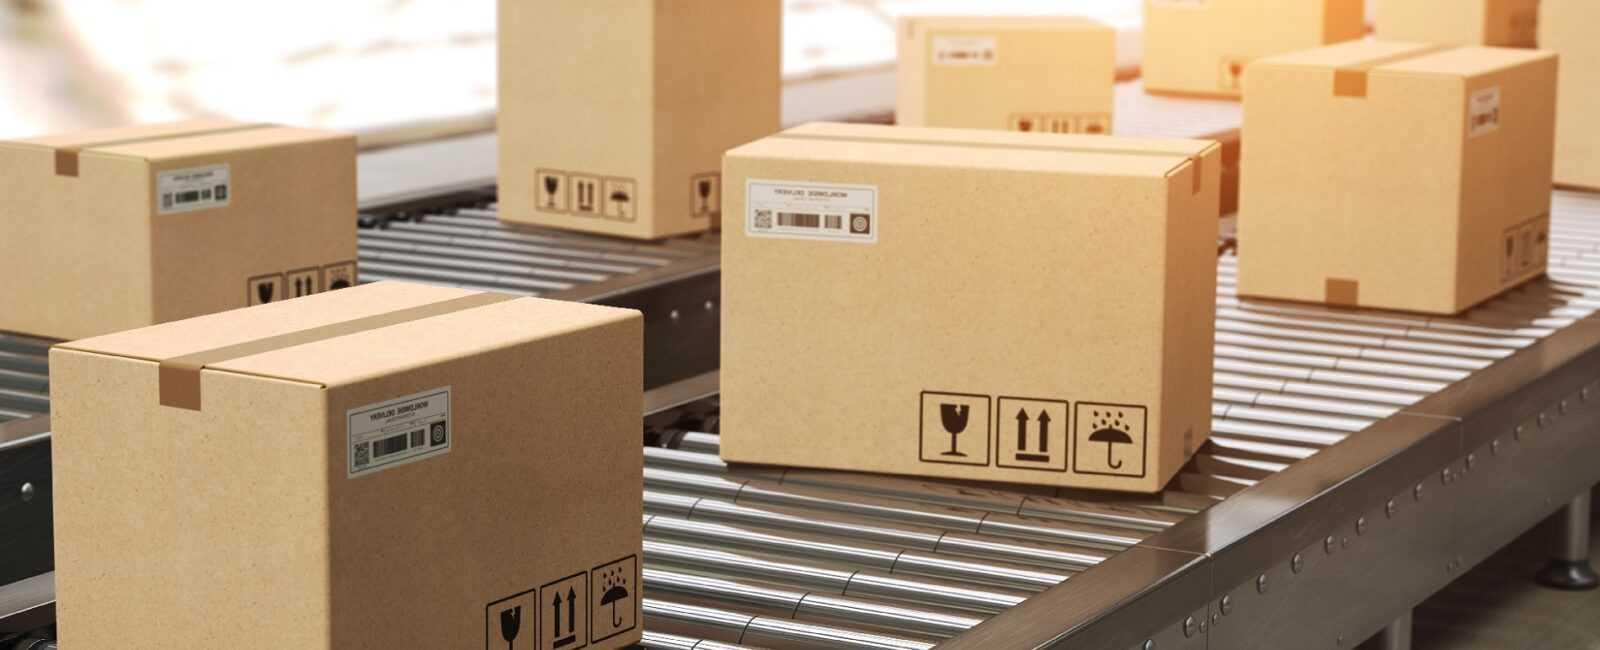 automatisering in de logistieke sector